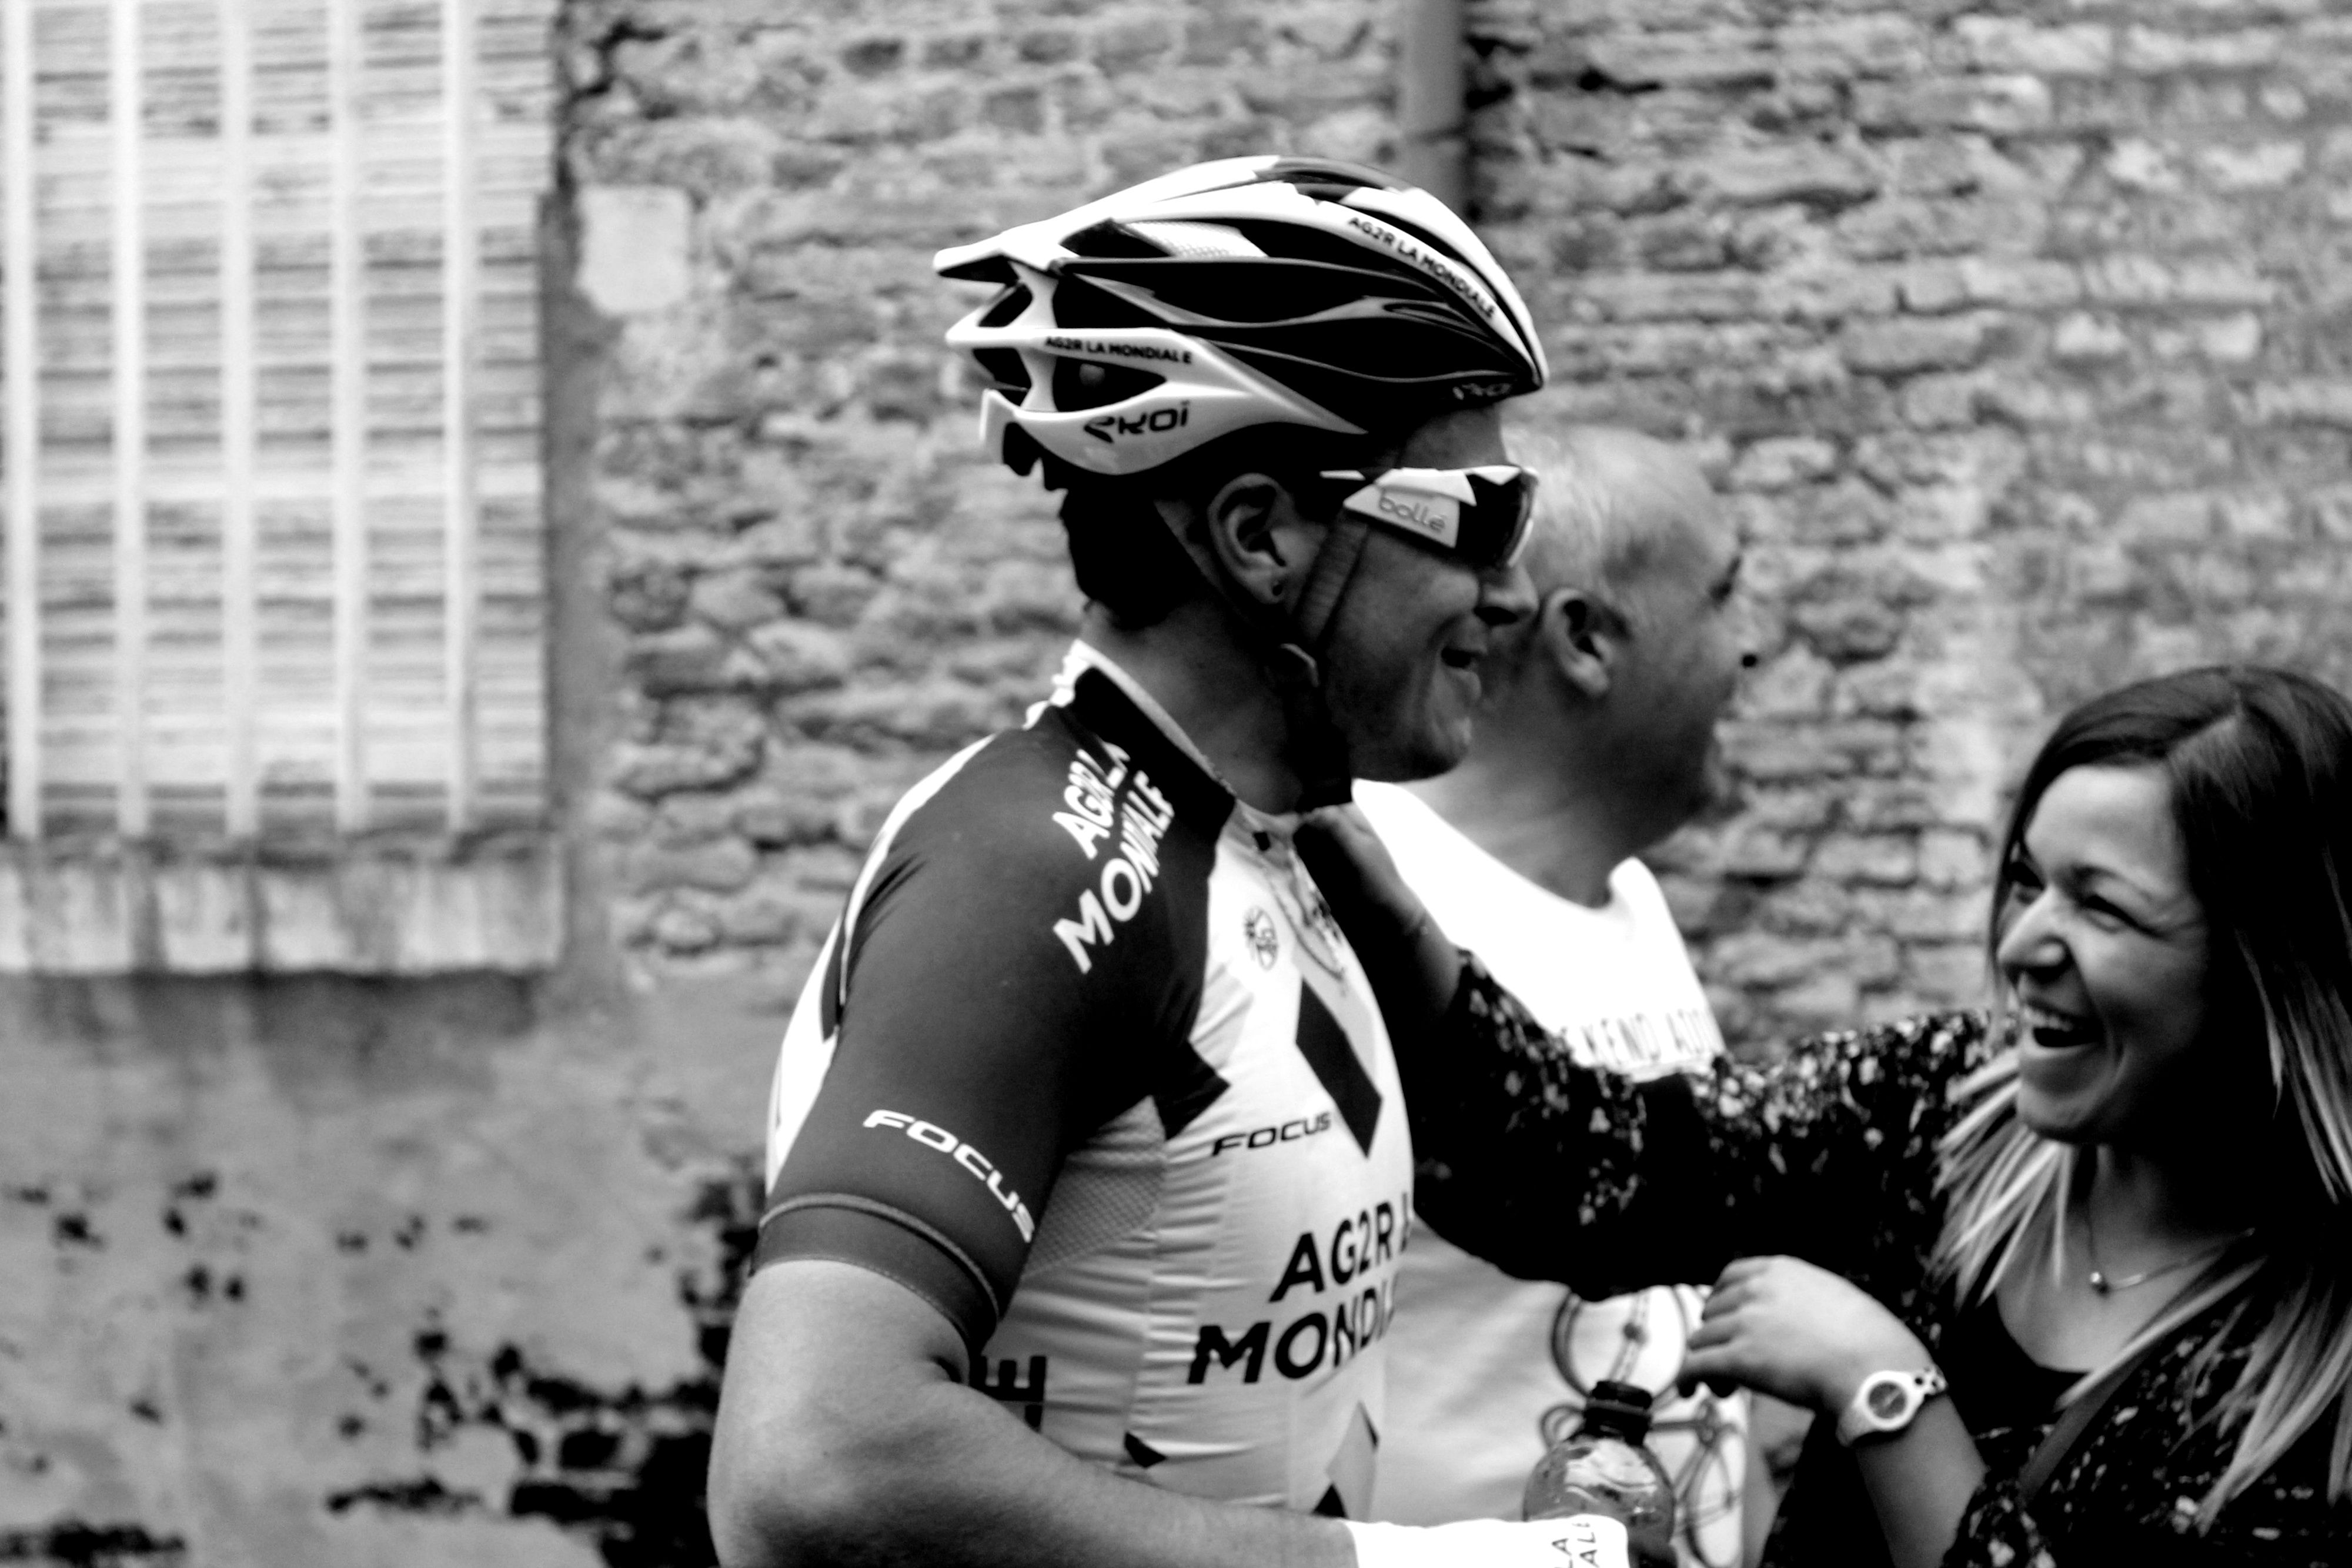 4 Jours de Dunkerque // Stage 3: Barlin - Saint-Omer (8 May 2015) Alexis Gougeard (stage winner)